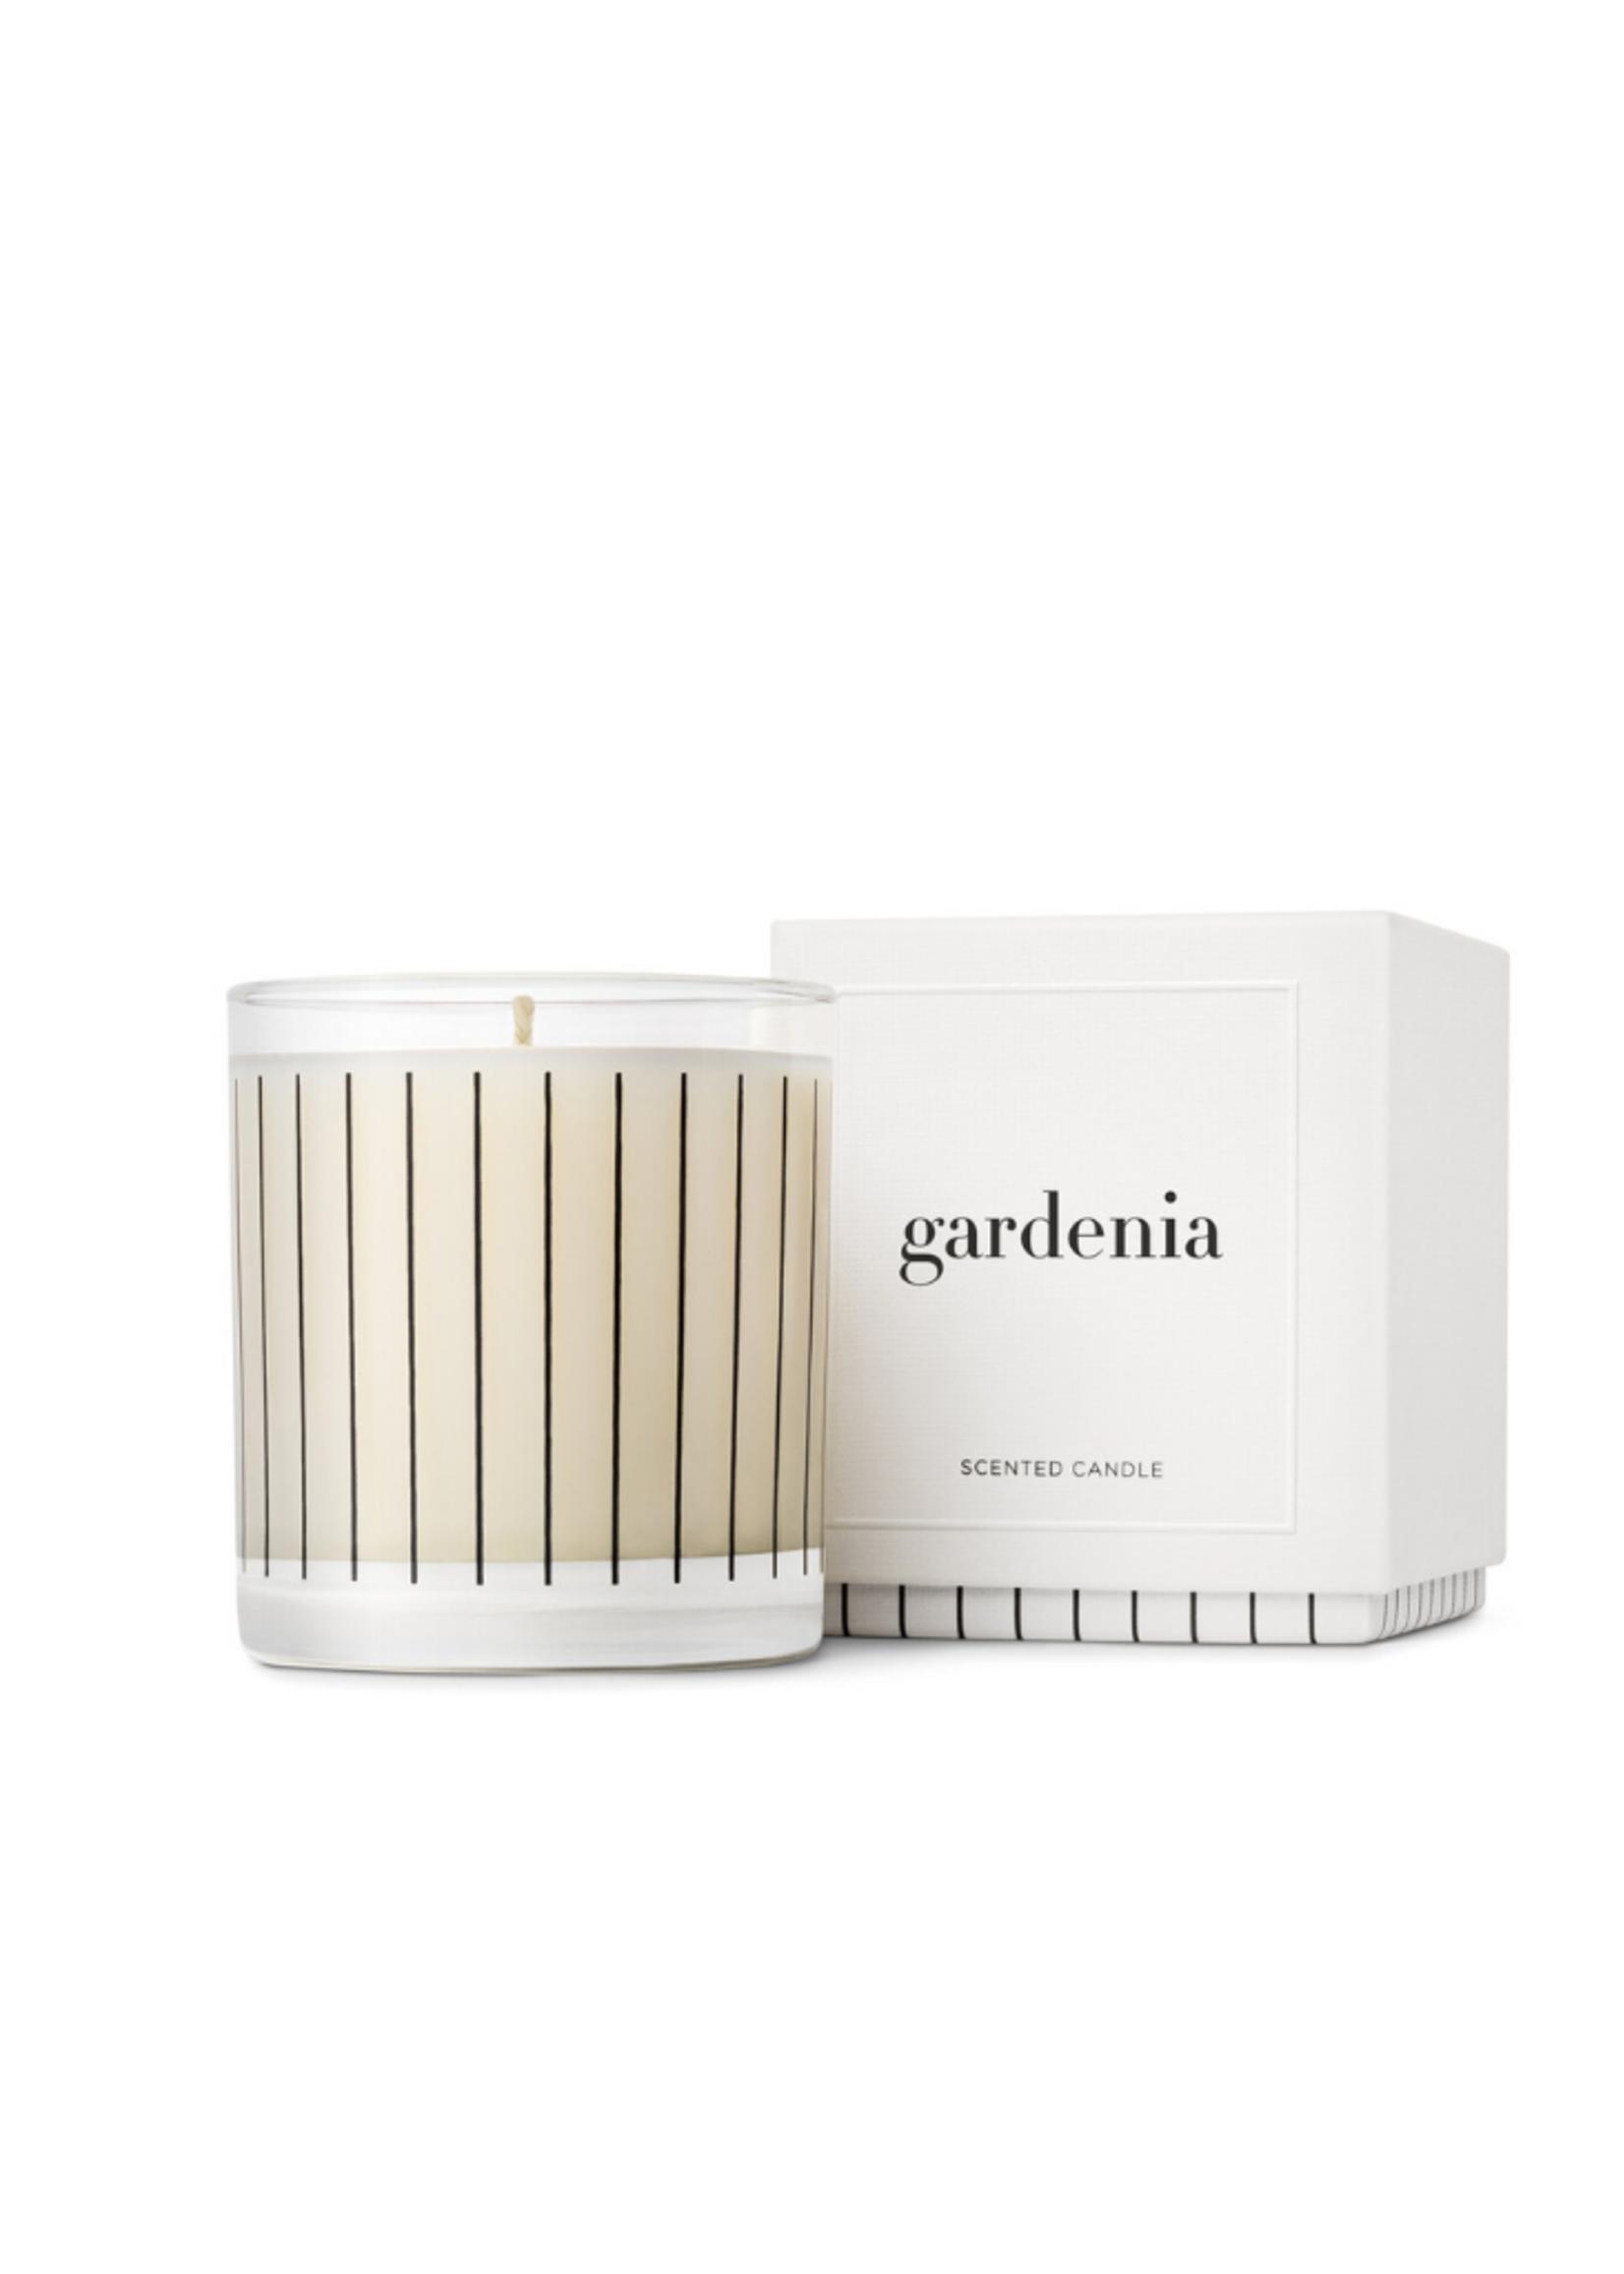 Studio Stockhome Gardenia Candle